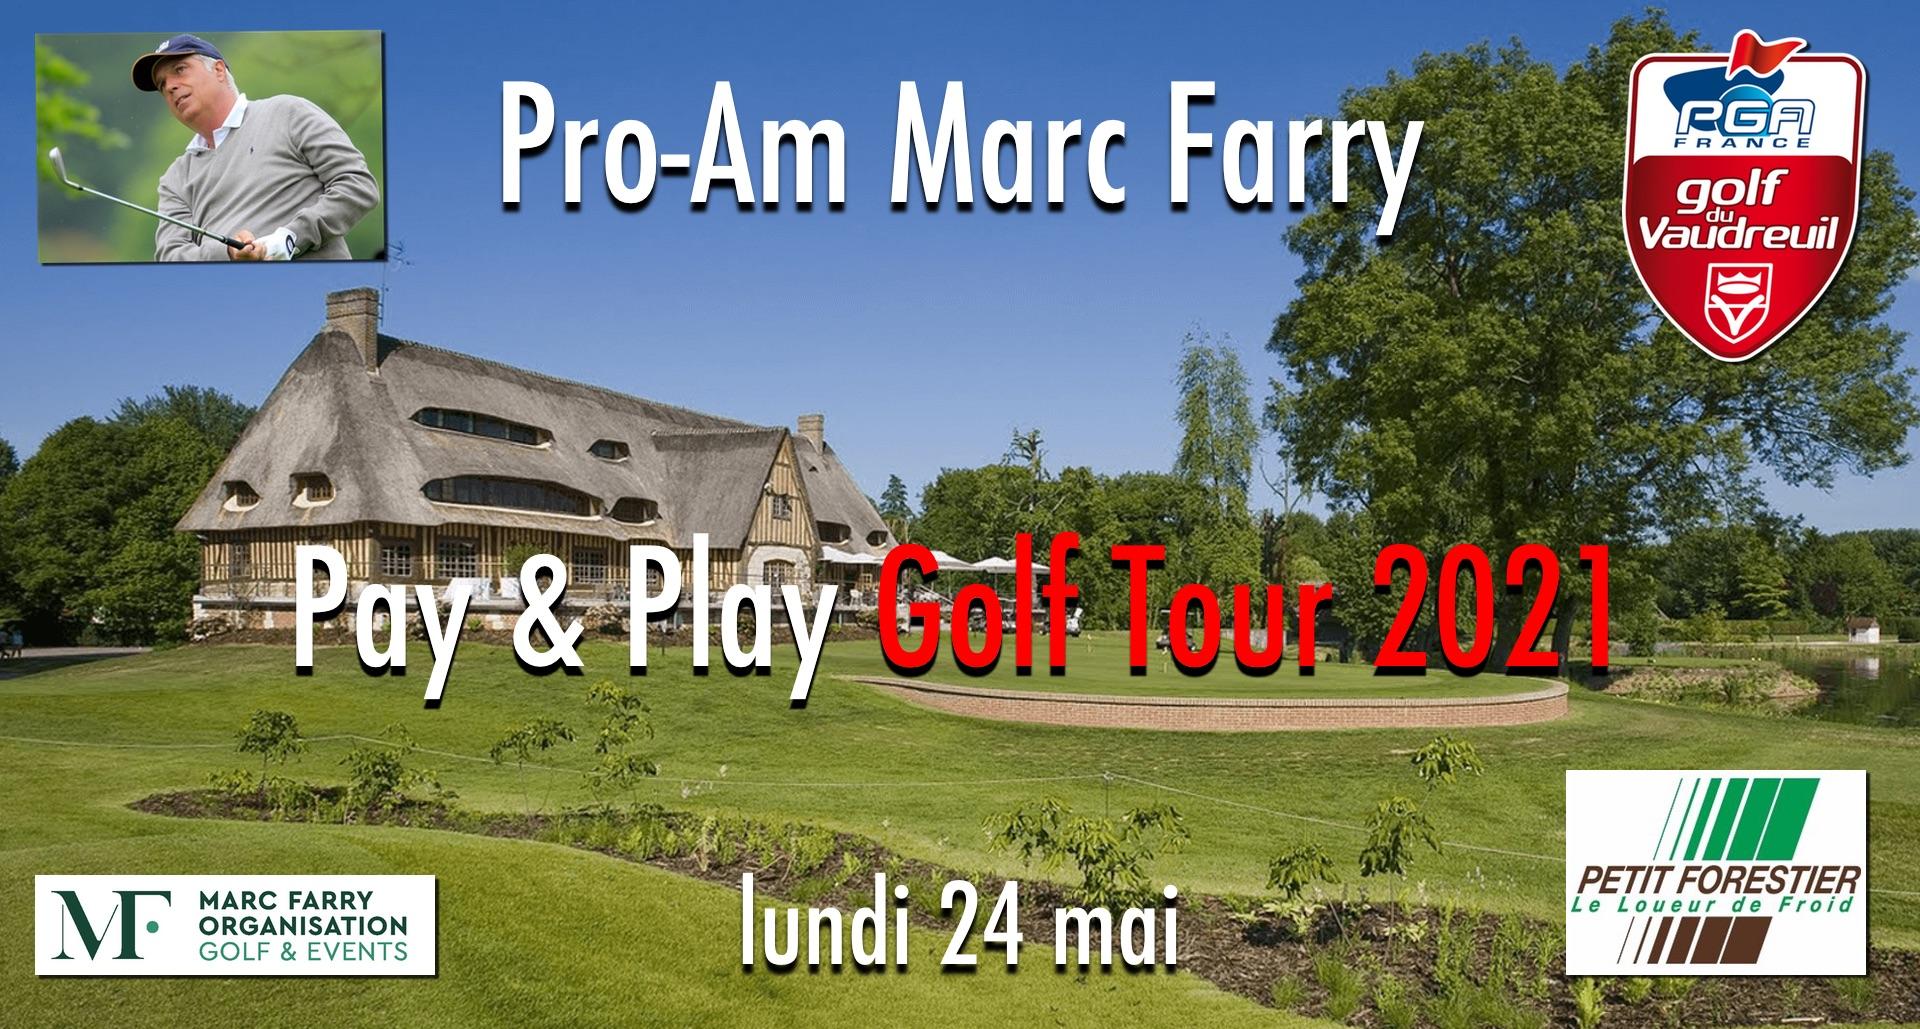 Pro-Am Marc Farry 2021 - Golf PGA France du Vaudreuil